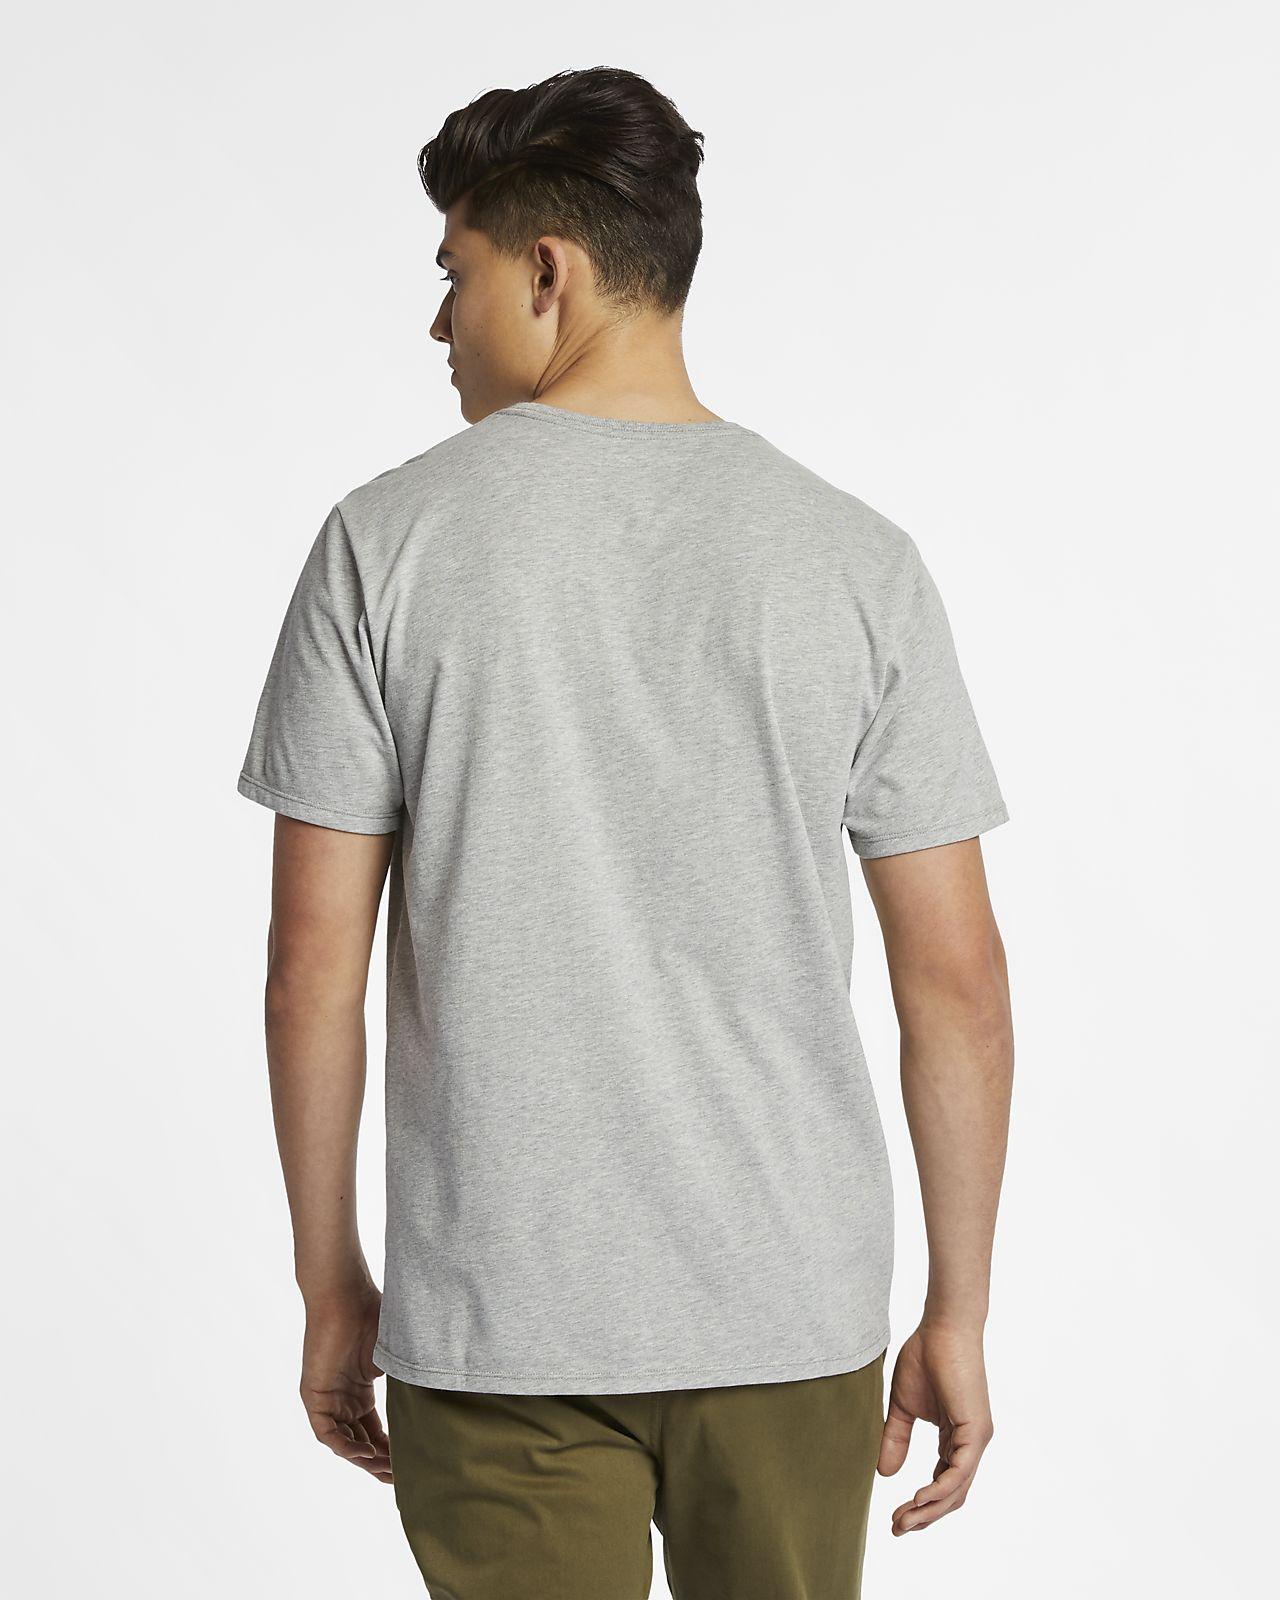 de85c1e9 Hurley Dri-FIT One And Only Men's T-Shirt. Nike.com